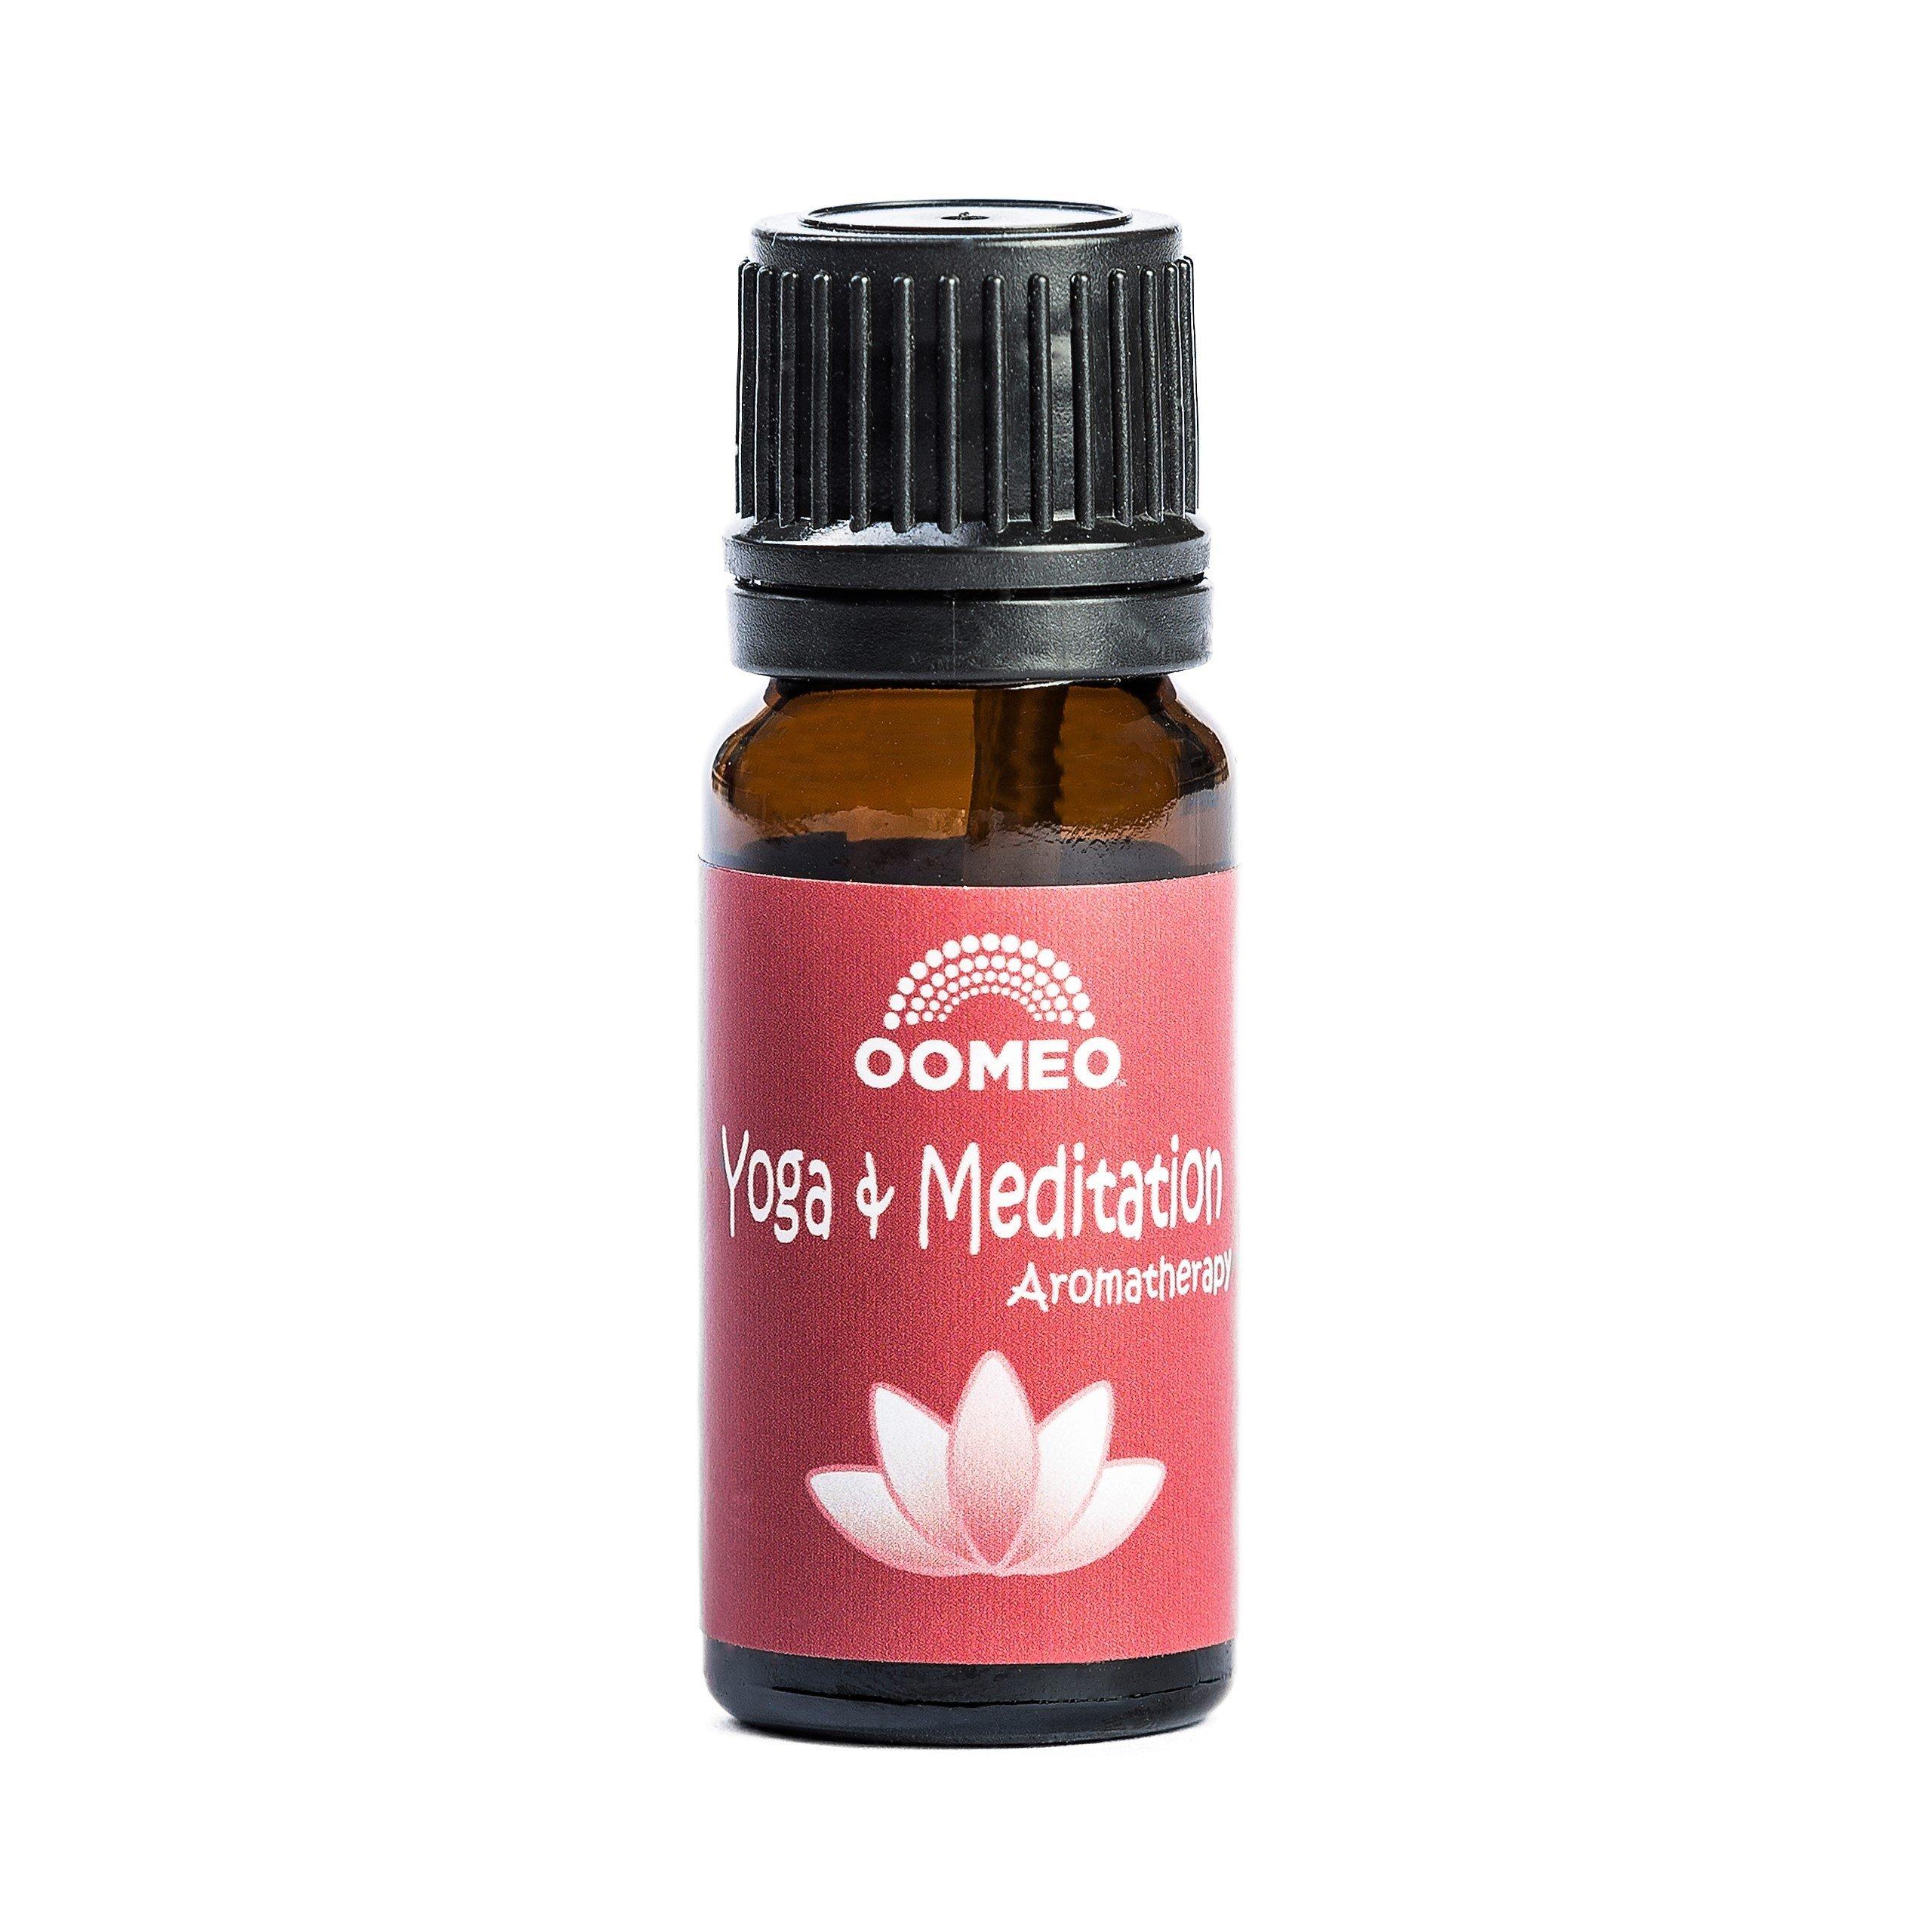 Yoga & meditation blend of essential oils